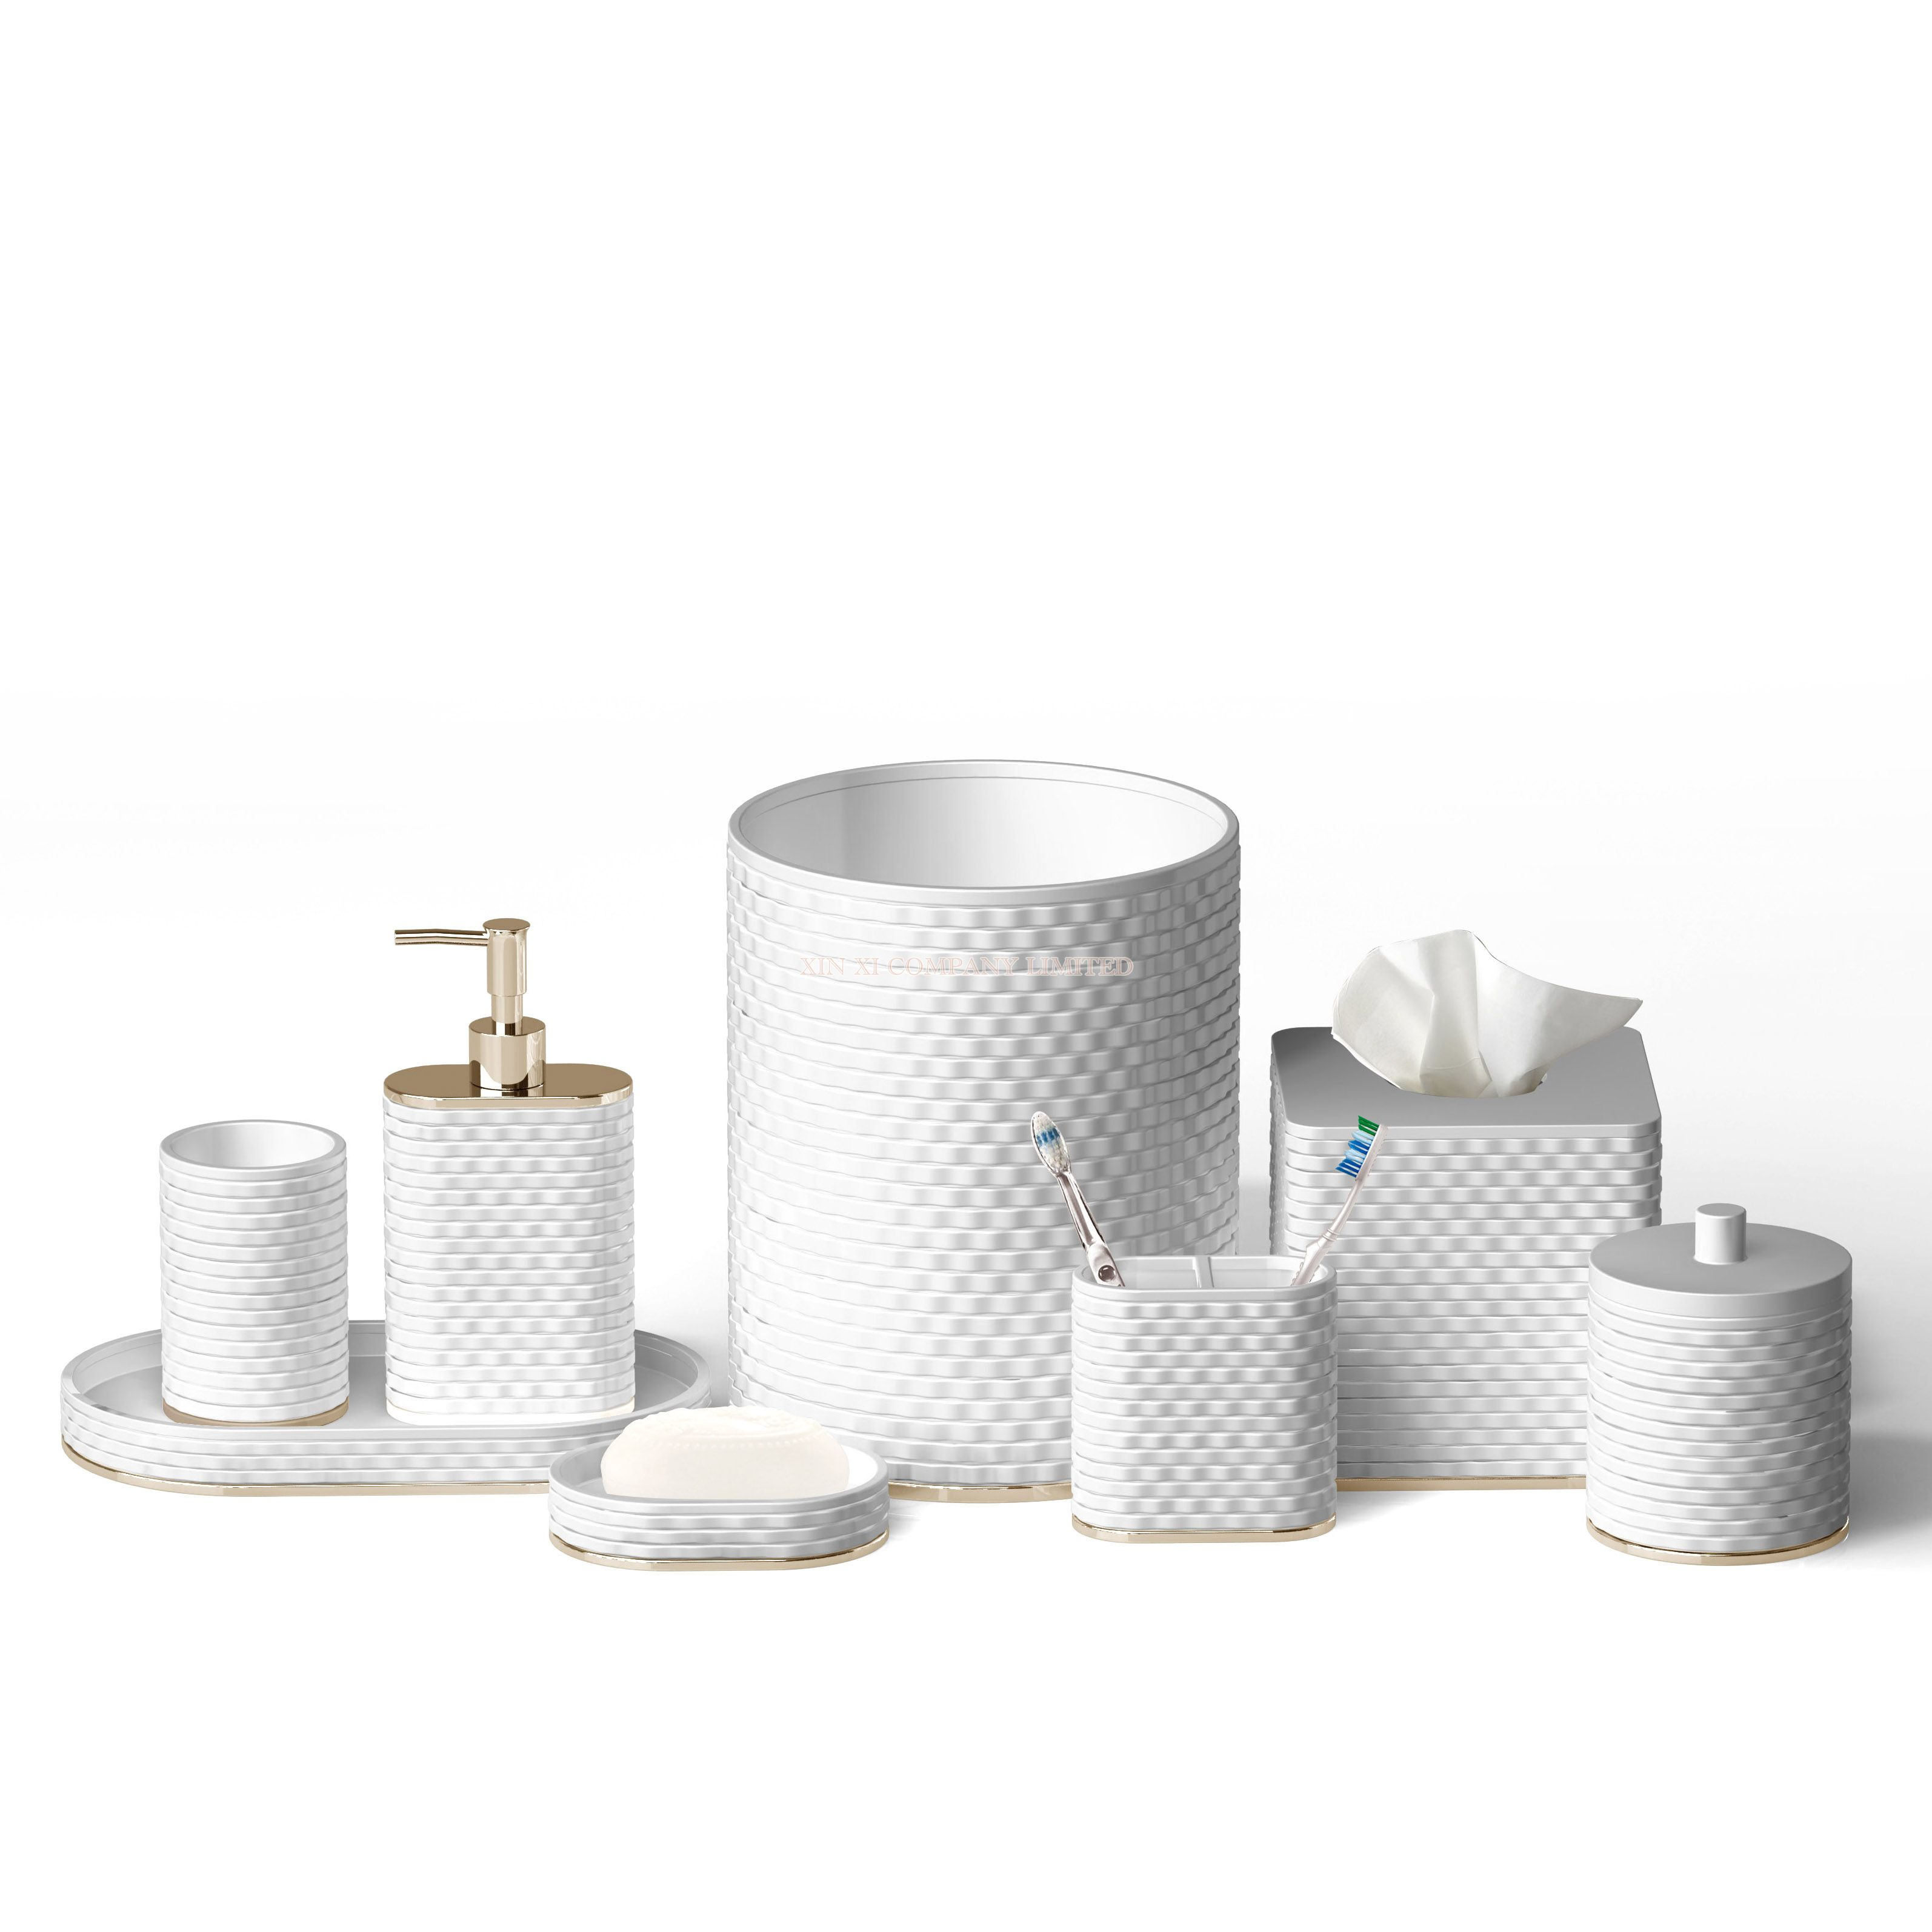 Fashionable style 8 pcs set ceramic with metal bathroom acessories